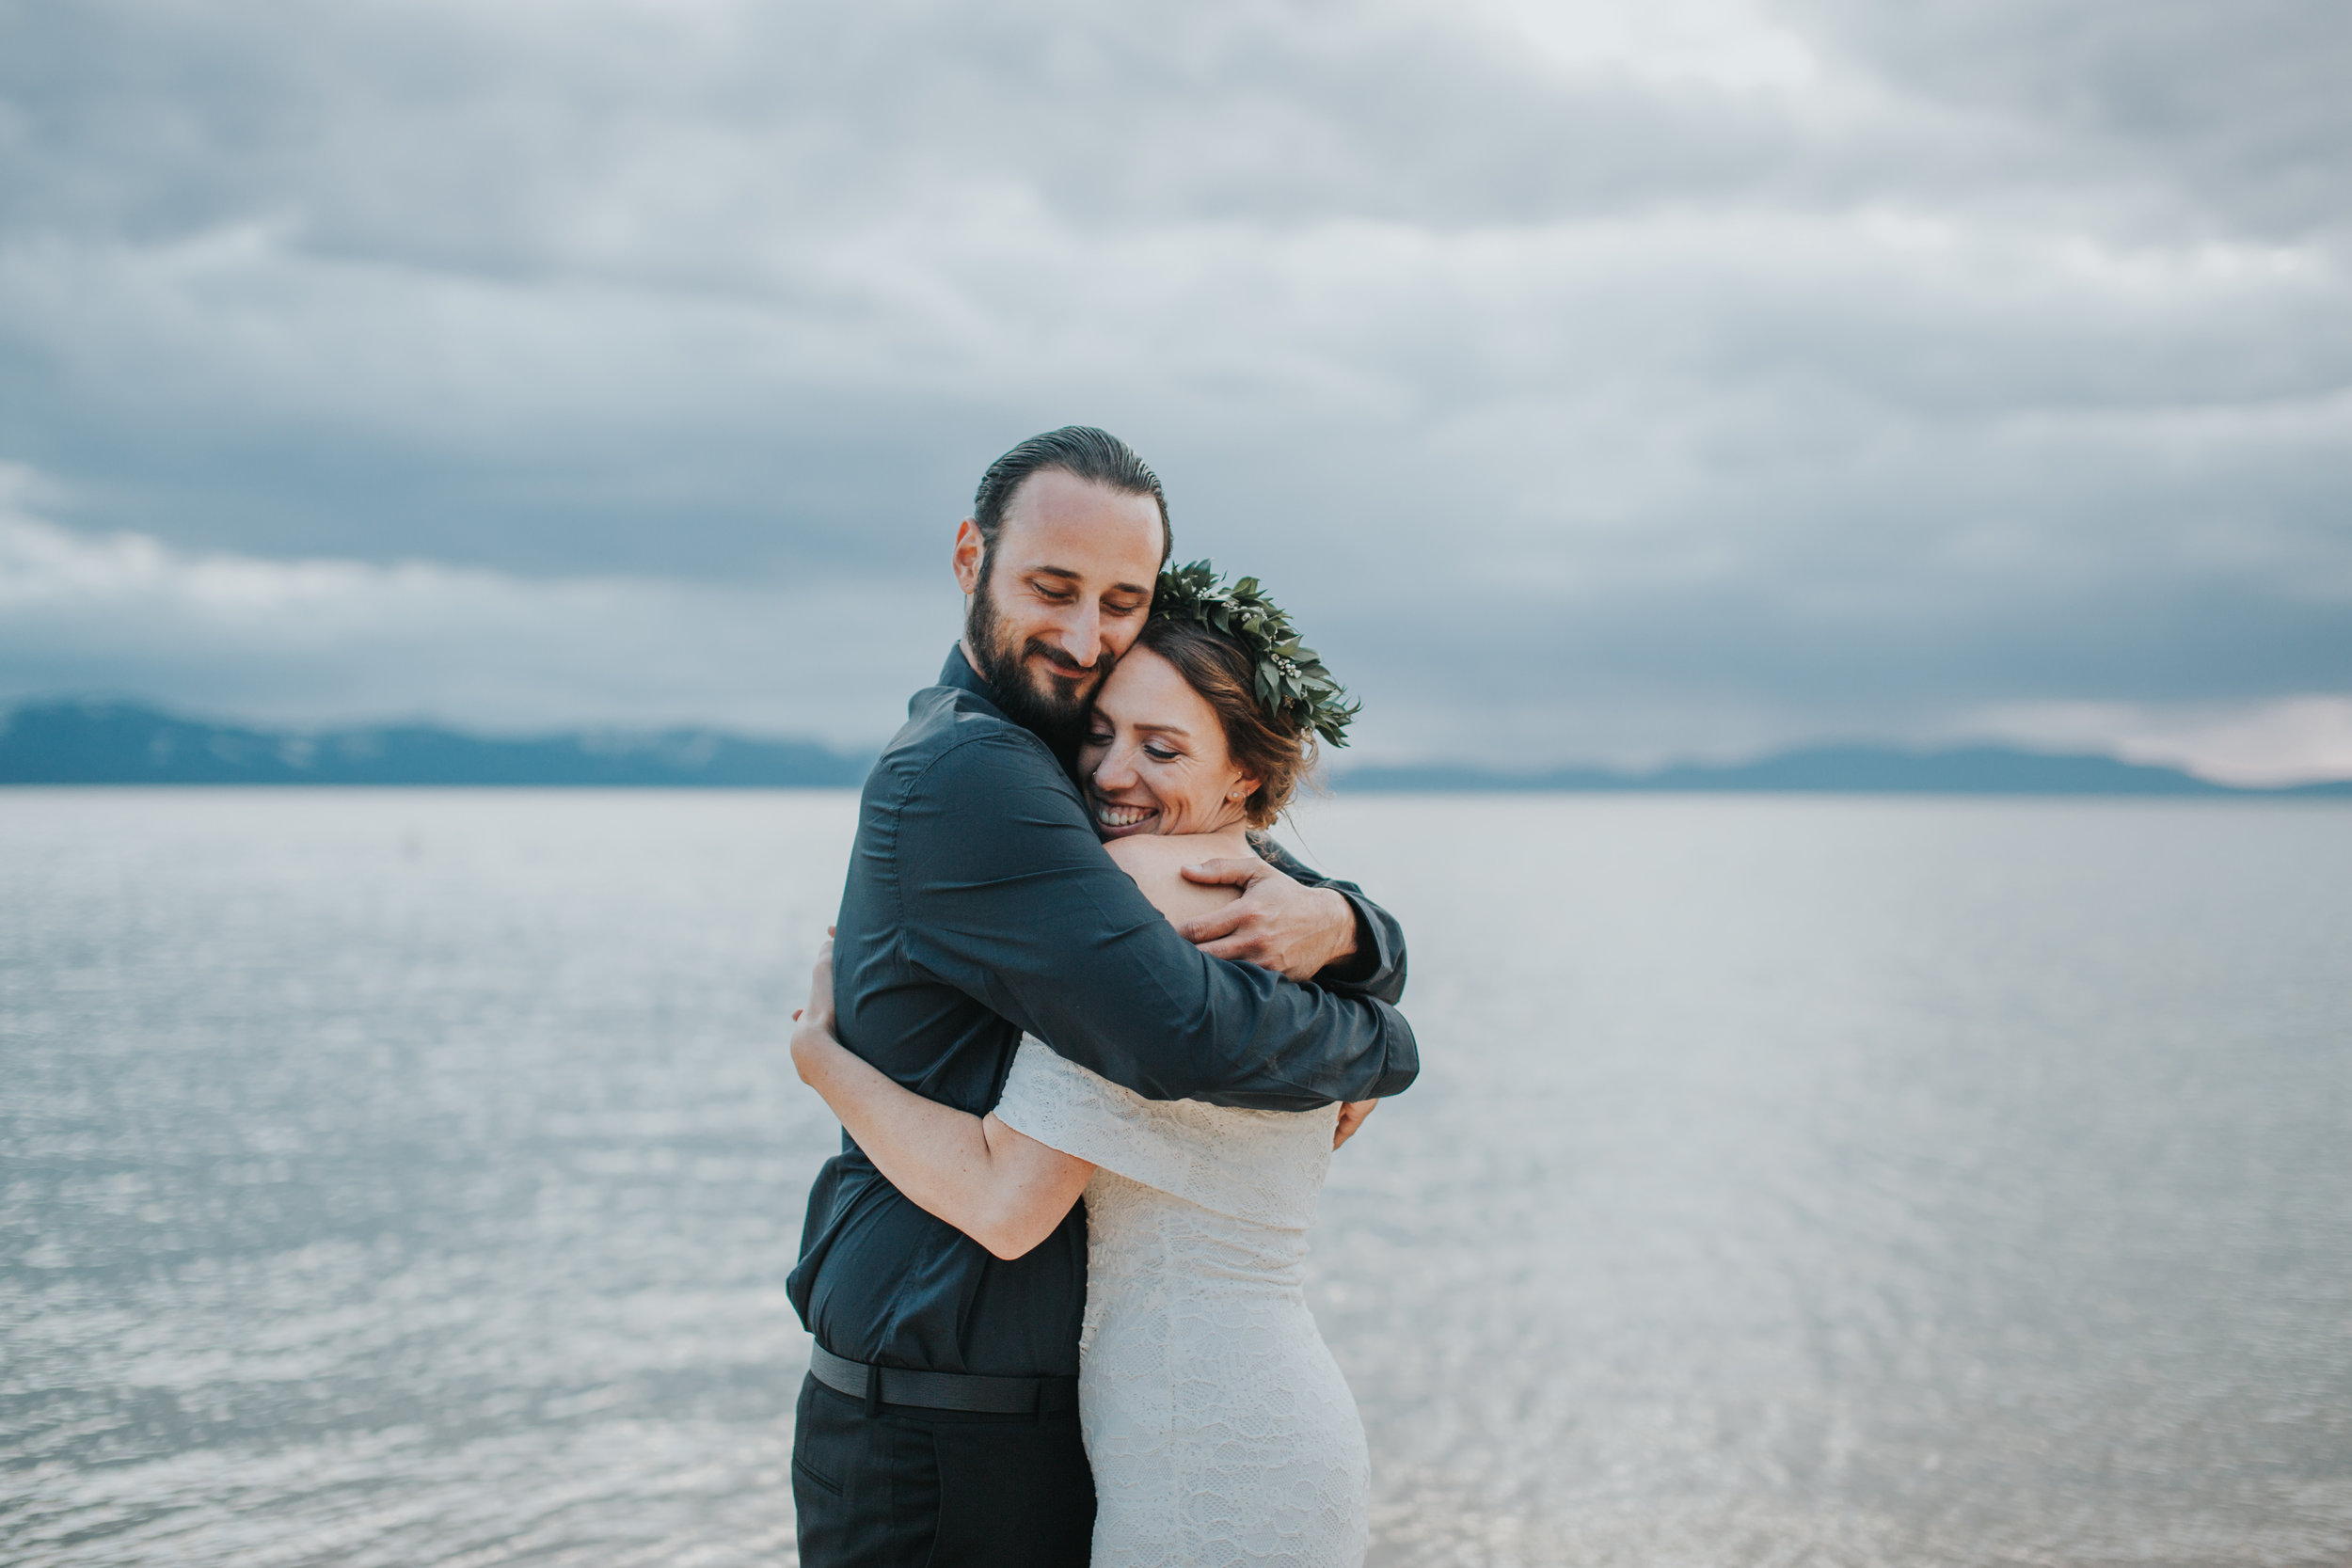 south-lake-tahoe-elopement-valerie-lendvay-photo-066.jpg